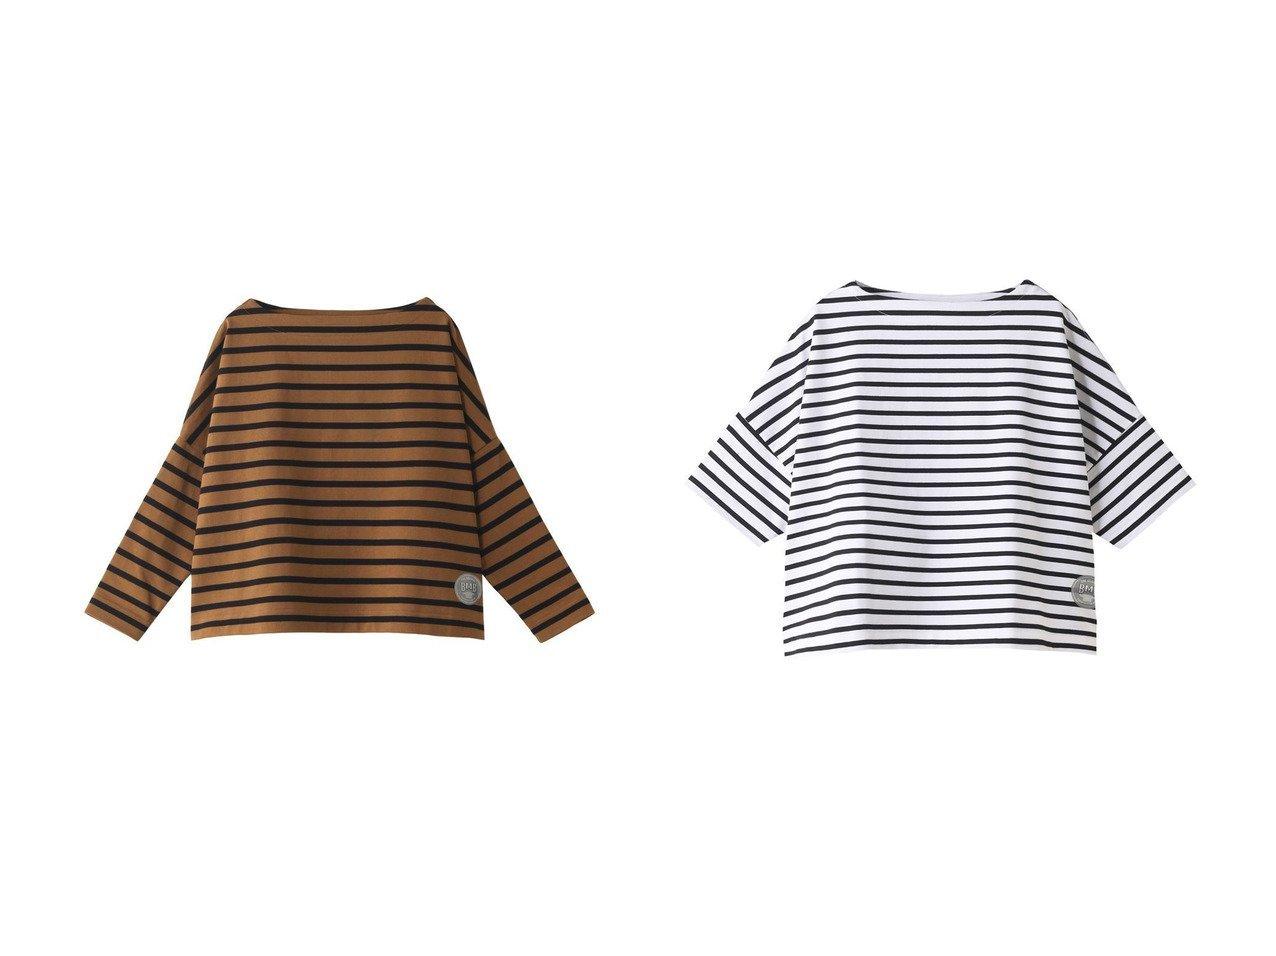 【heliopole/エリオポール】の【Traditional Weatherwear】BMB SHIRT Tシャツ&【Traditional Weatherwear】S Tシャツ トップス・カットソーのおすすめ!人気、トレンド・レディースファッションの通販 おすすめで人気の流行・トレンド、ファッションの通販商品 メンズファッション・キッズファッション・インテリア・家具・レディースファッション・服の通販 founy(ファニー) https://founy.com/ ファッション Fashion レディースファッション WOMEN トップス カットソー Tops Tshirt シャツ/ブラウス Shirts Blouses ロング / Tシャツ T-Shirts カットソー Cut and Sewn 2021年 2021 2021 春夏 S/S SS Spring/Summer 2021 S/S 春夏 SS Spring/Summer ショート スリーブ ボーダー 春 Spring |ID:crp329100000024834